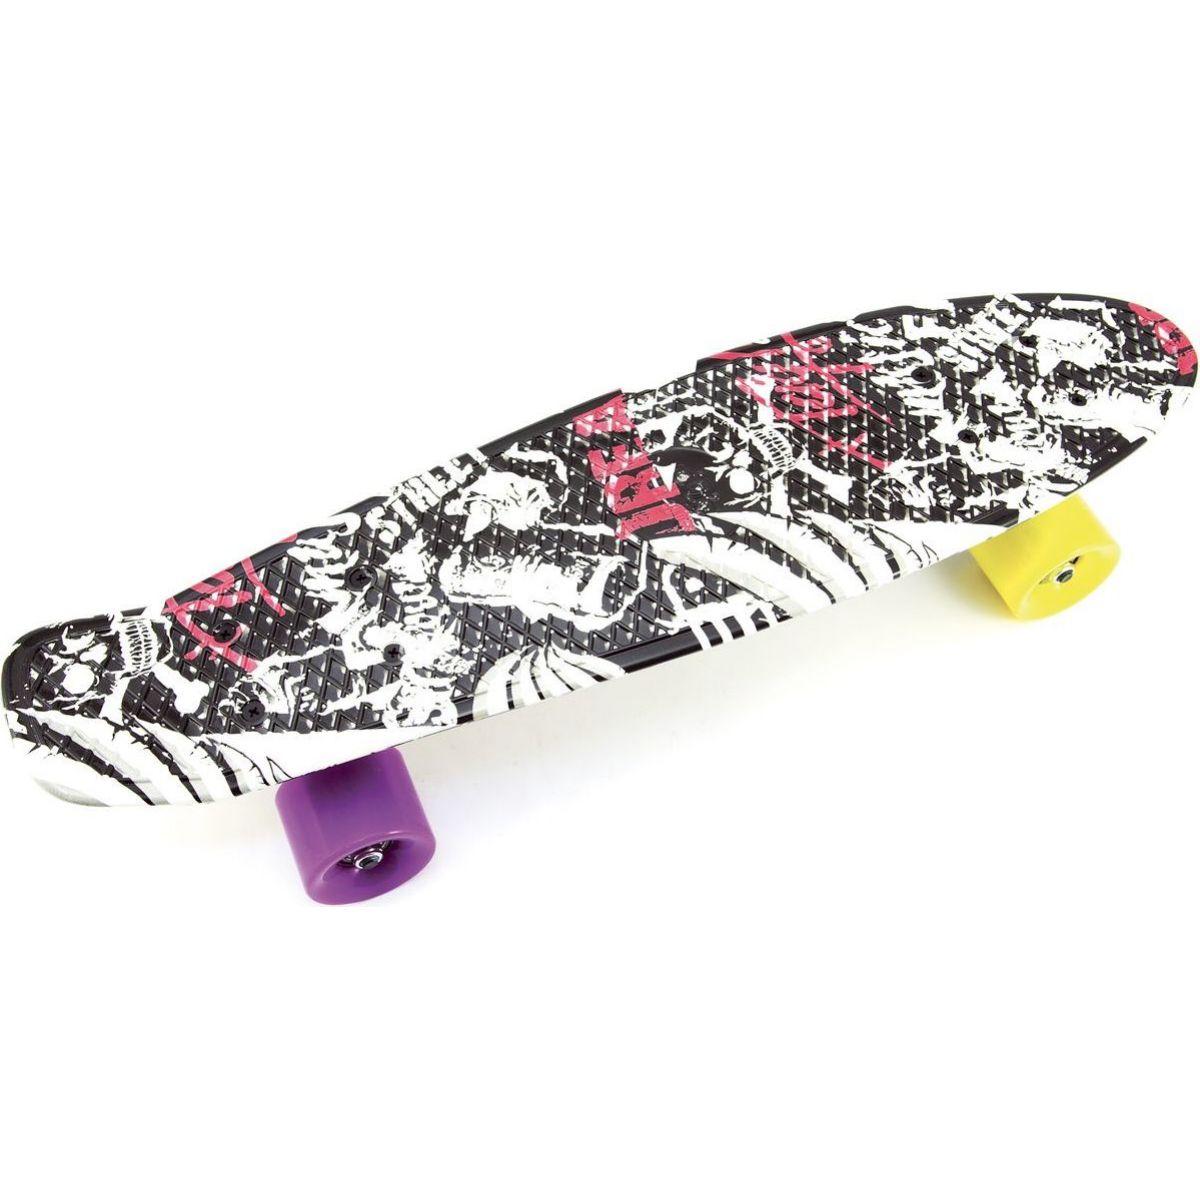 Skateboard pennyboard 60 cm čiernobiely vzor